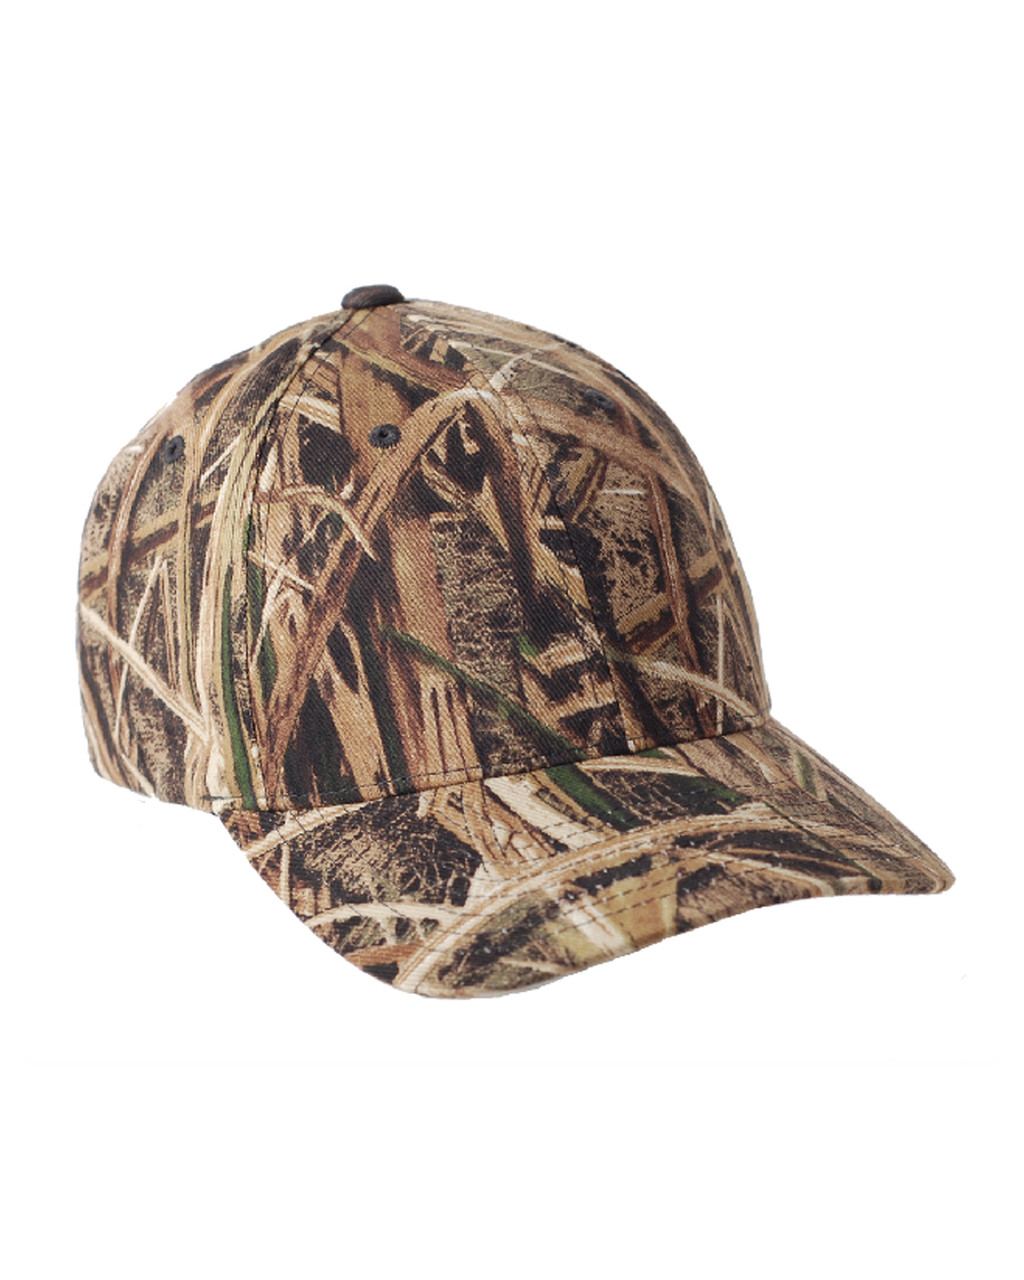 Fitted Baseball Hat Stretch Mesh Cap 6911 2 Colors Flexfit Mossy Oak Camo